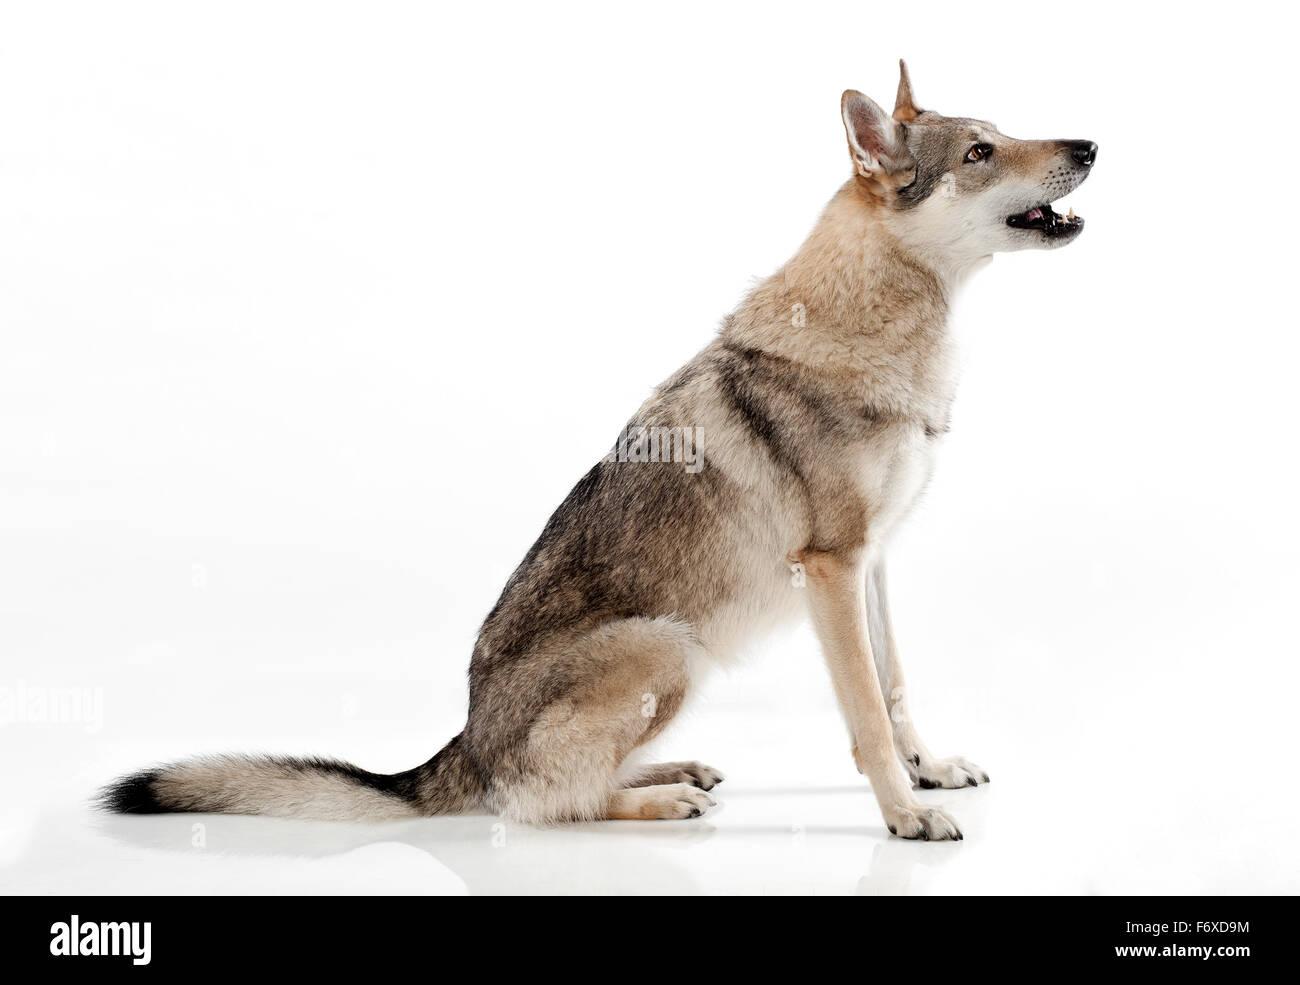 Czechoslovakian wolf-dog, a hybrid between a German Shepherd dog and Carpathian wolf Stock Photo